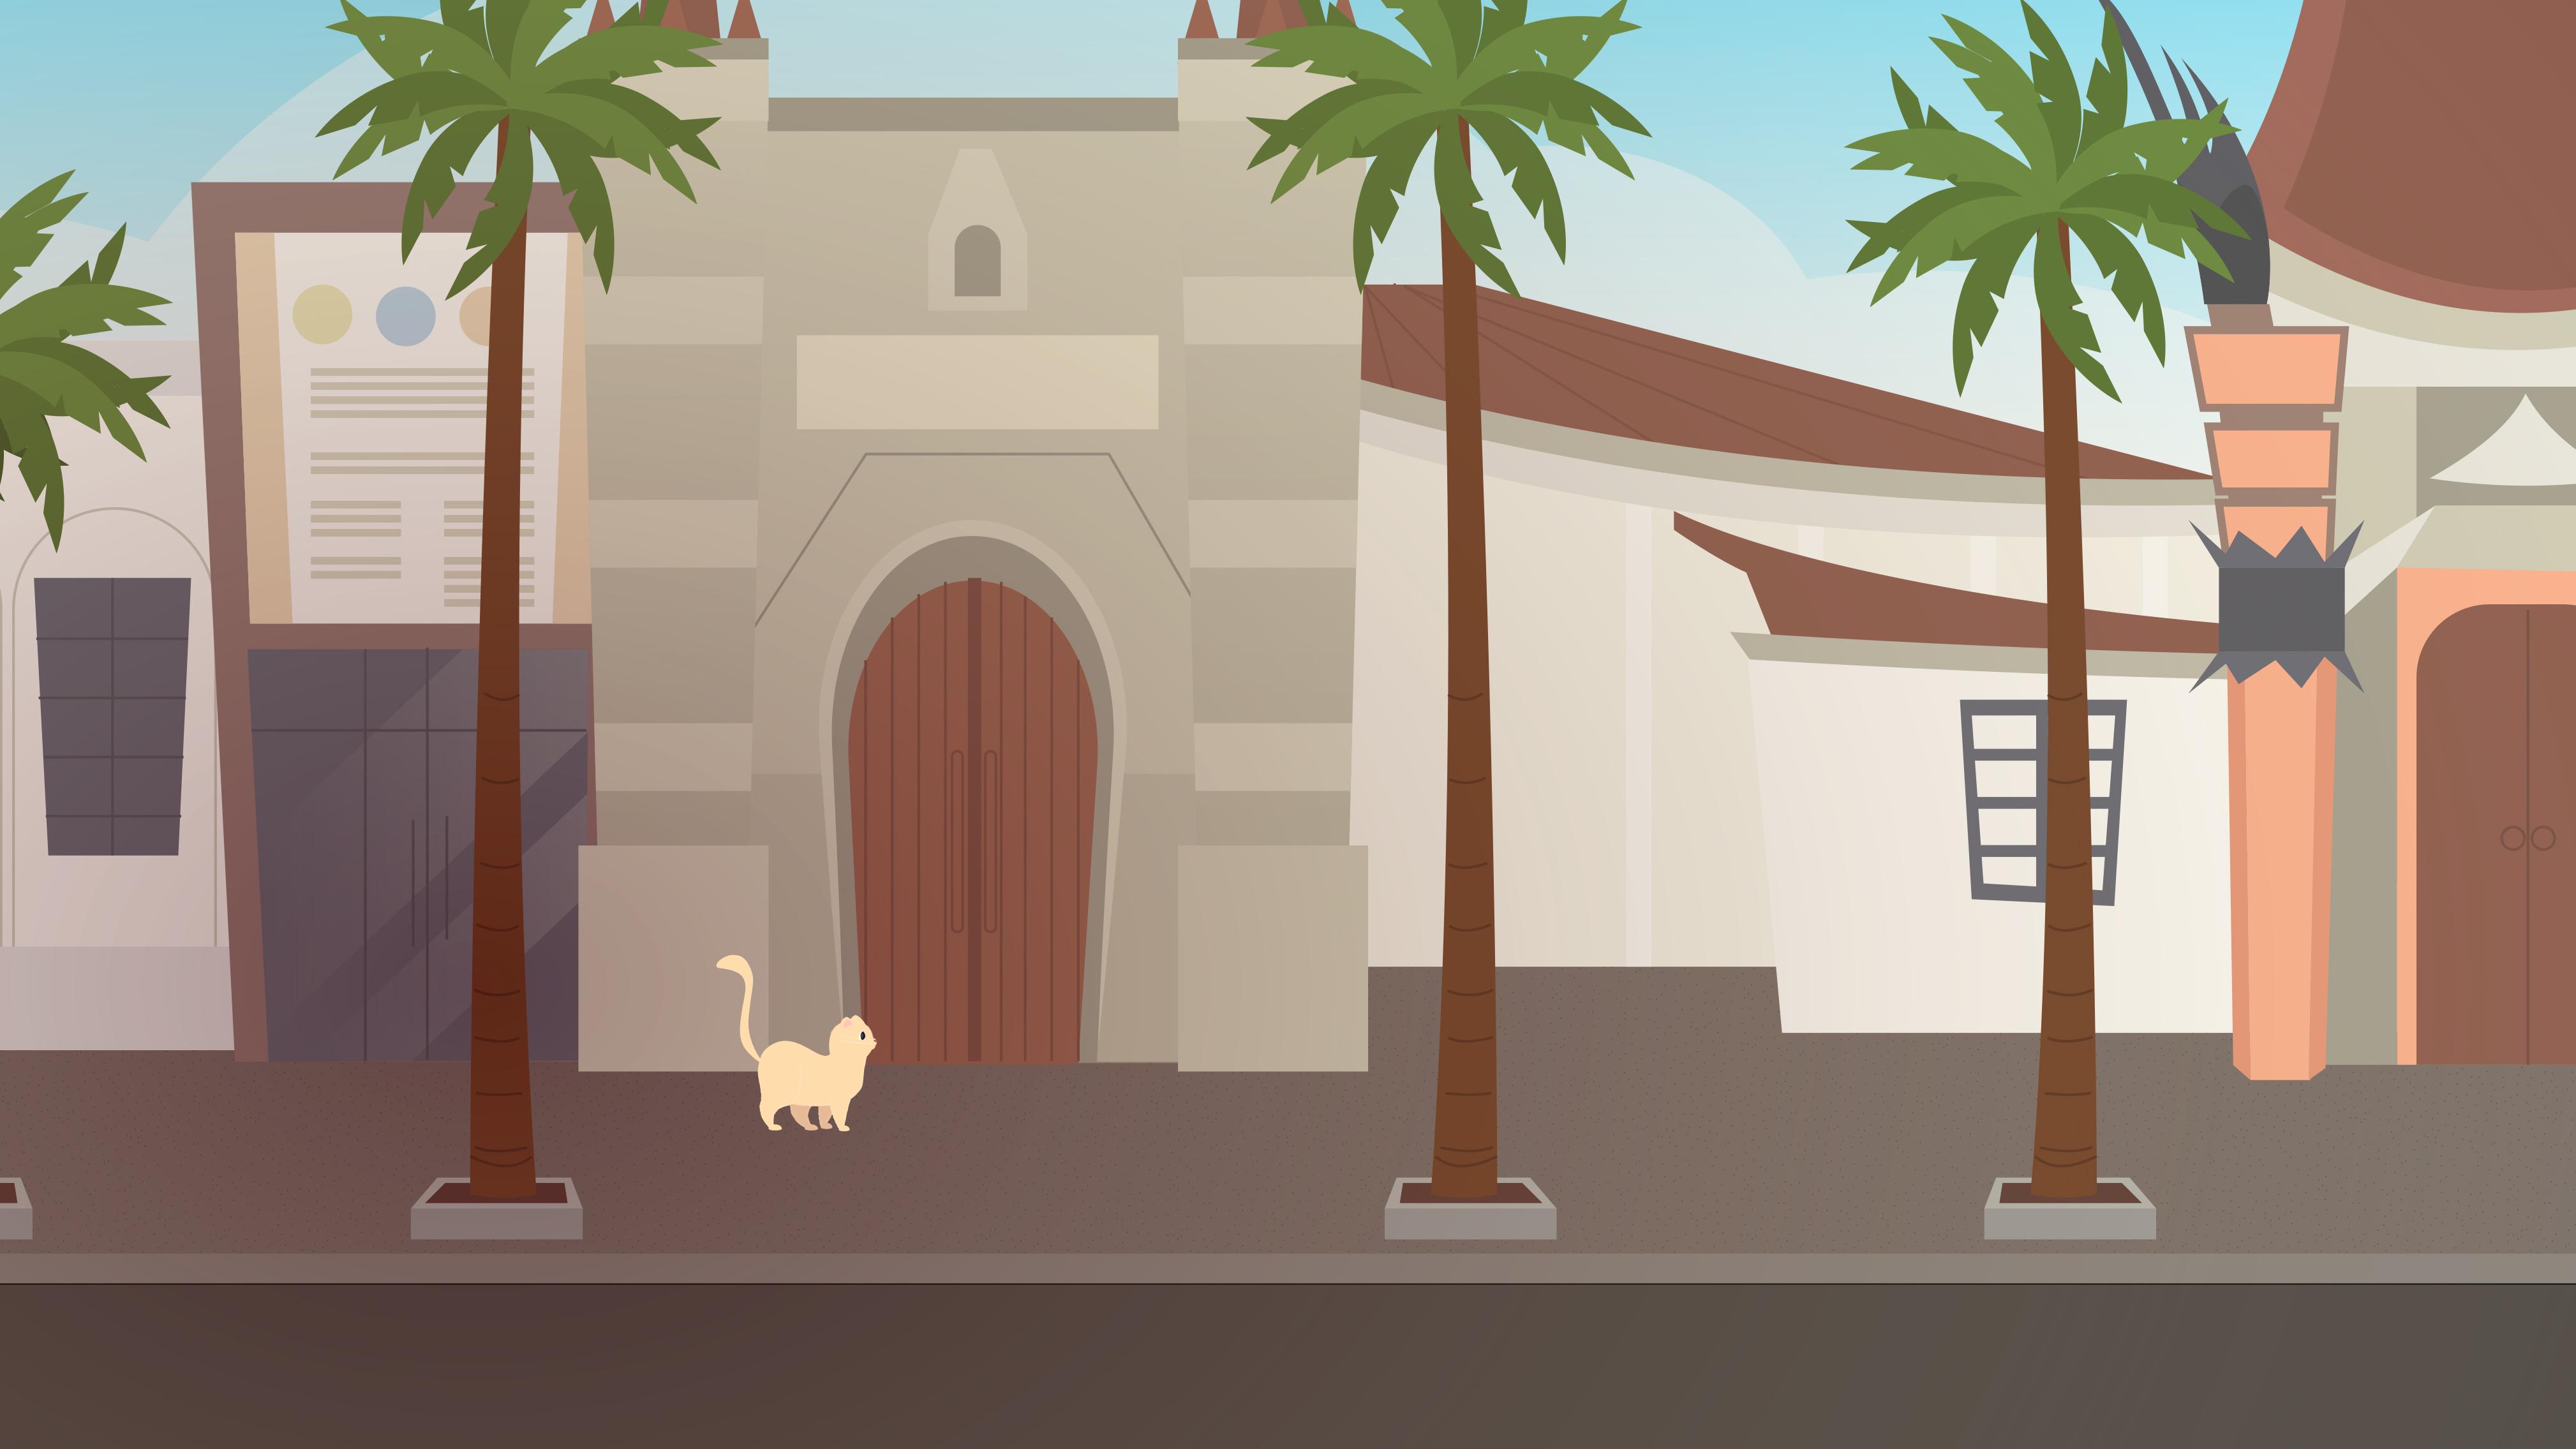 Charity - Animated Marketing Video